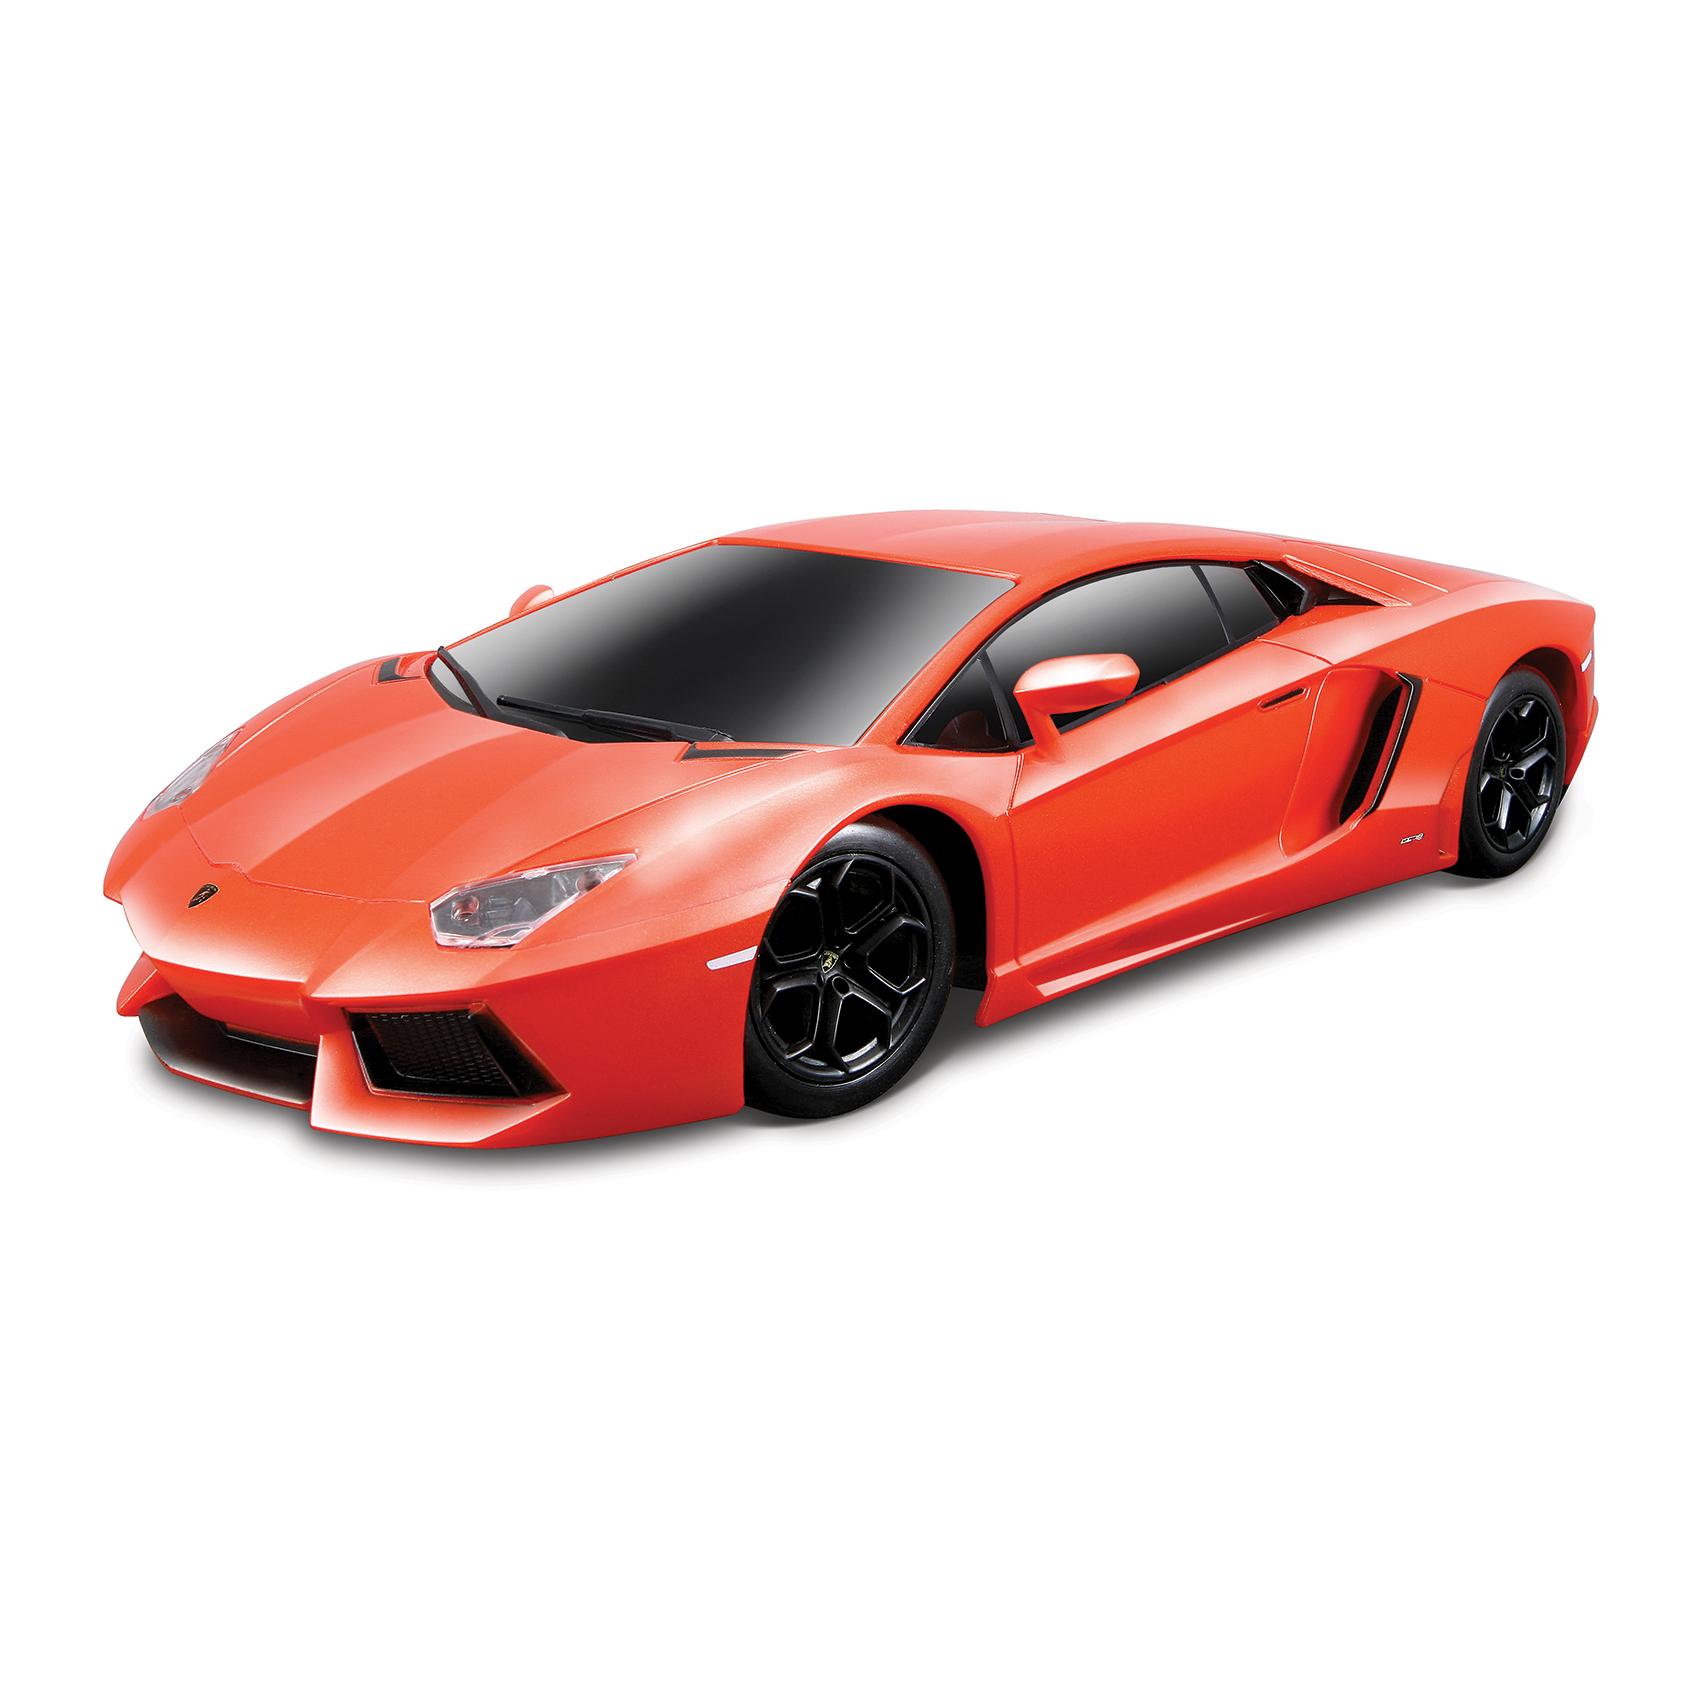 Masinuta Maisto MotoSounds Lamborghini Aventador 1:24